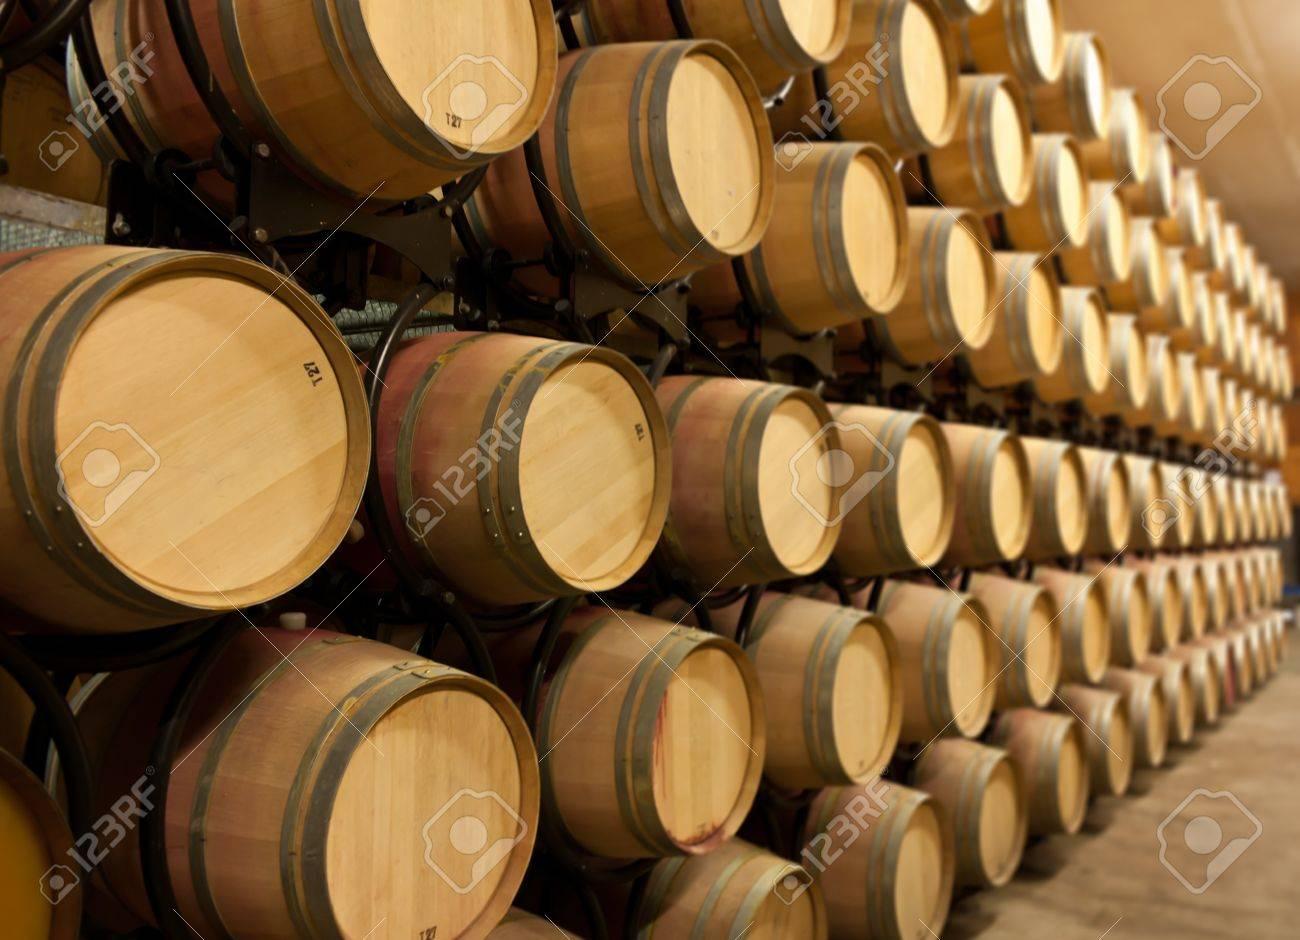 stacked oak barrels. Oak Wine Barrels Stacked Up In A Winery Aging Room Stock Photo - 7415780 I